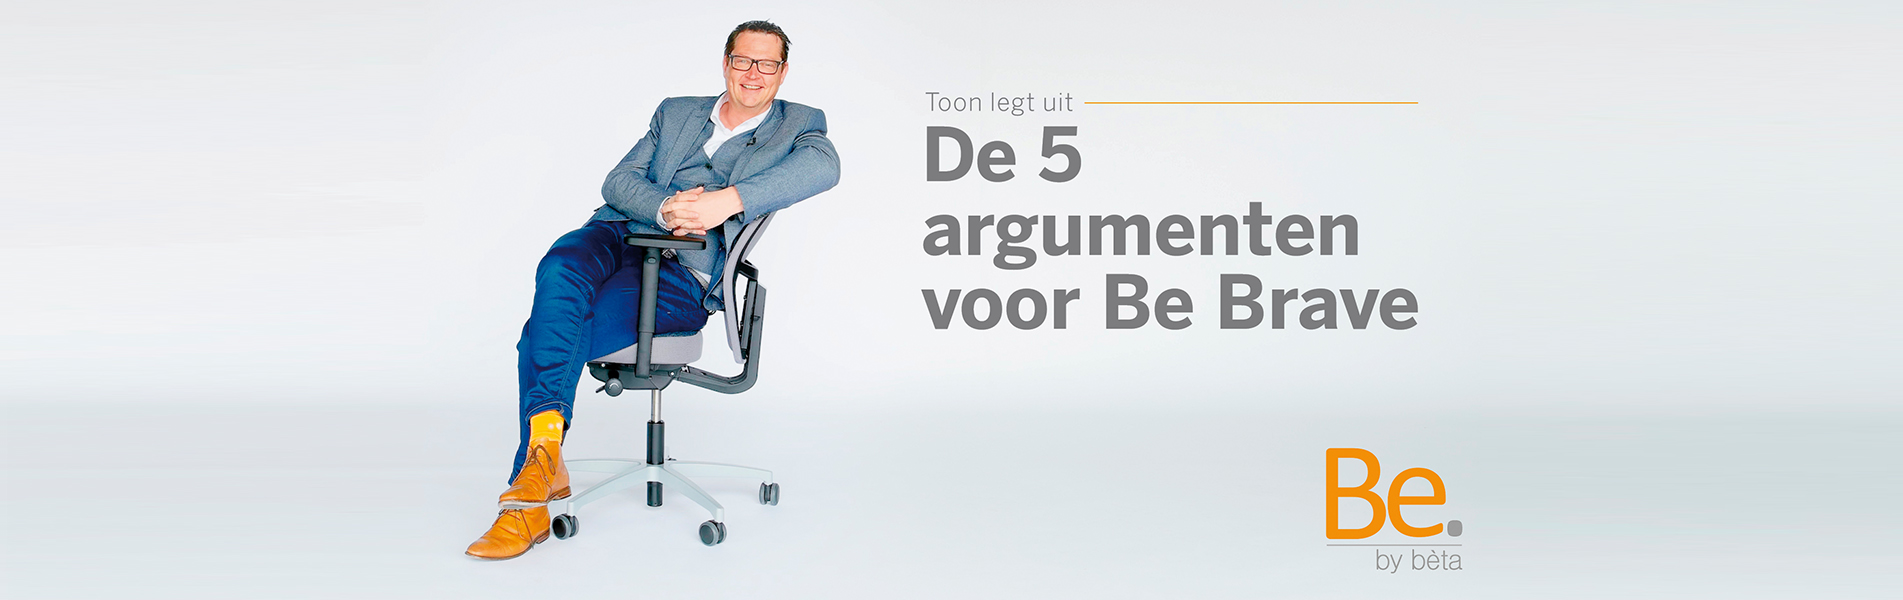 Nieuwe Bureau Stoel.Introductie Nieuwe Bureaustoel Be Brave Be By Beta